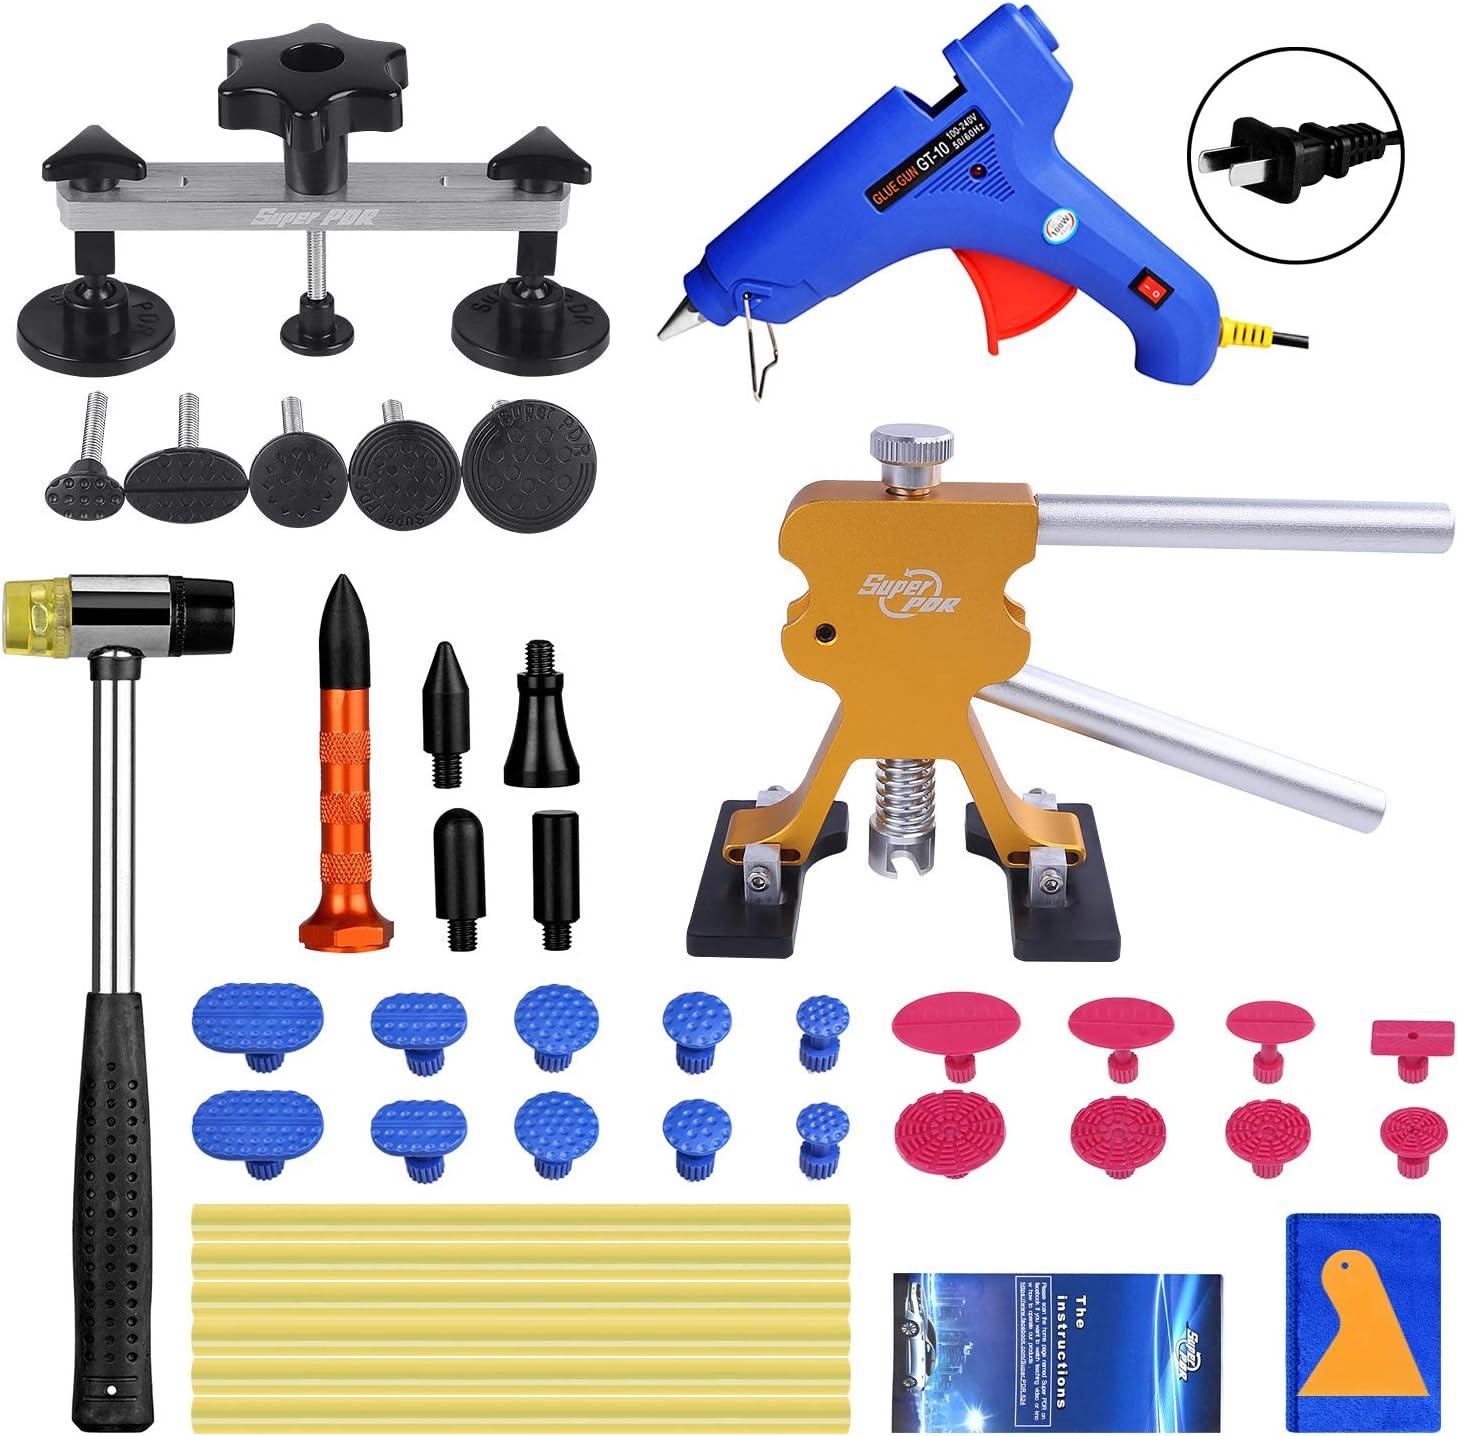 Super PDR Paintless Dent Repair (PDR Tool) Kit 42Pcs Car Dent Puller Removal Dent Remover Kit